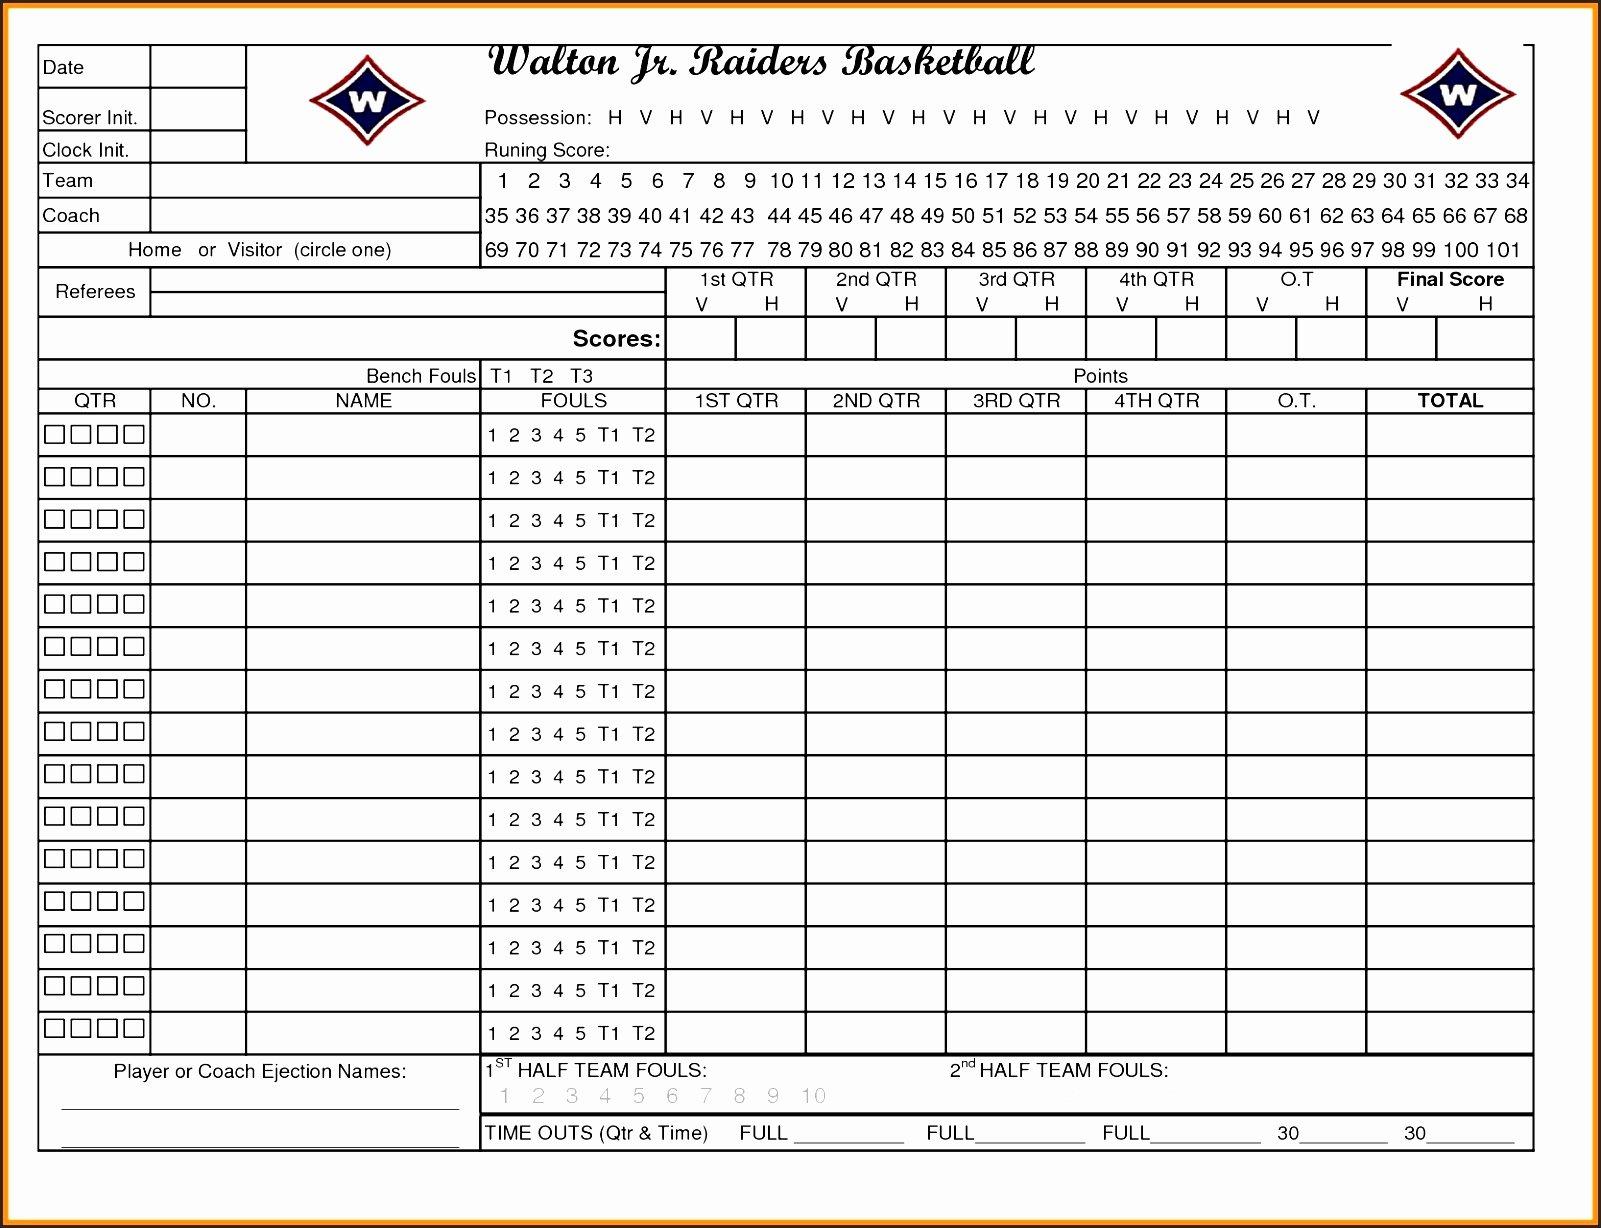 Softball Stats Spreadsheet Or Baseball Stats Excel Spreadsheet ... In Baseball Team Stats Spreadsheet